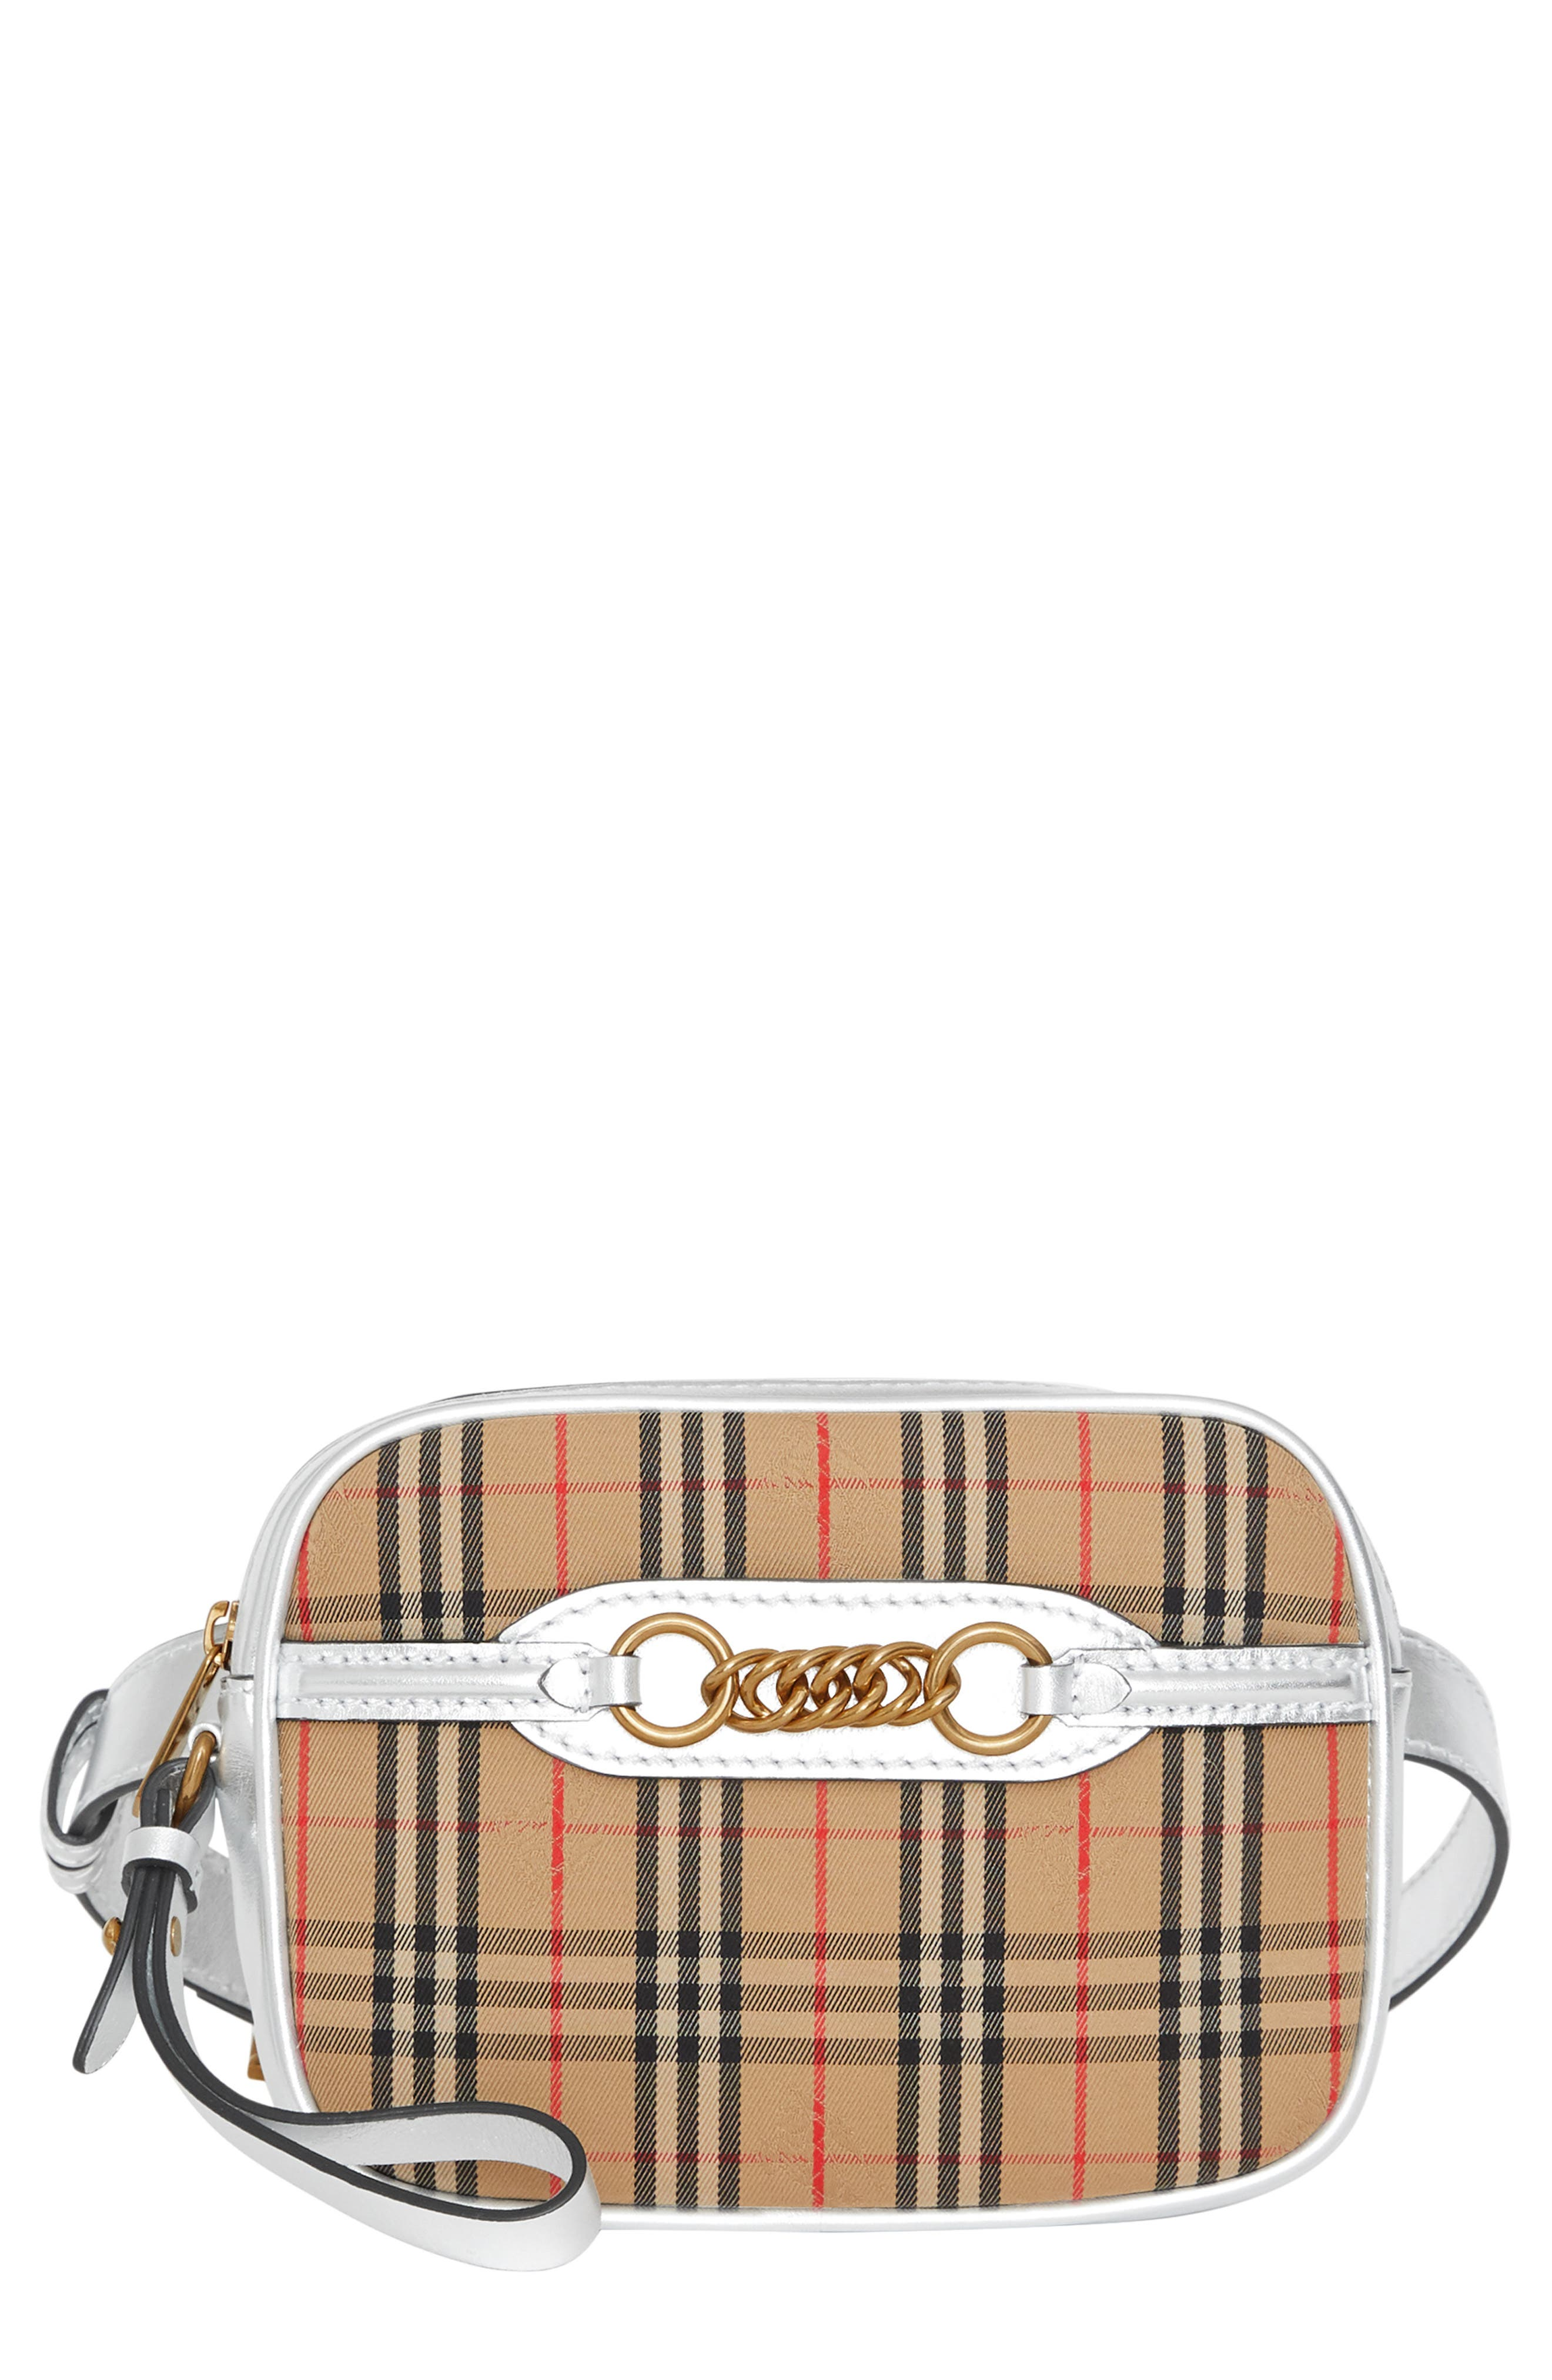 Vintage Check Link Bum Bag,                         Main,                         color, ANTIQUE YELLOW/ SILVER